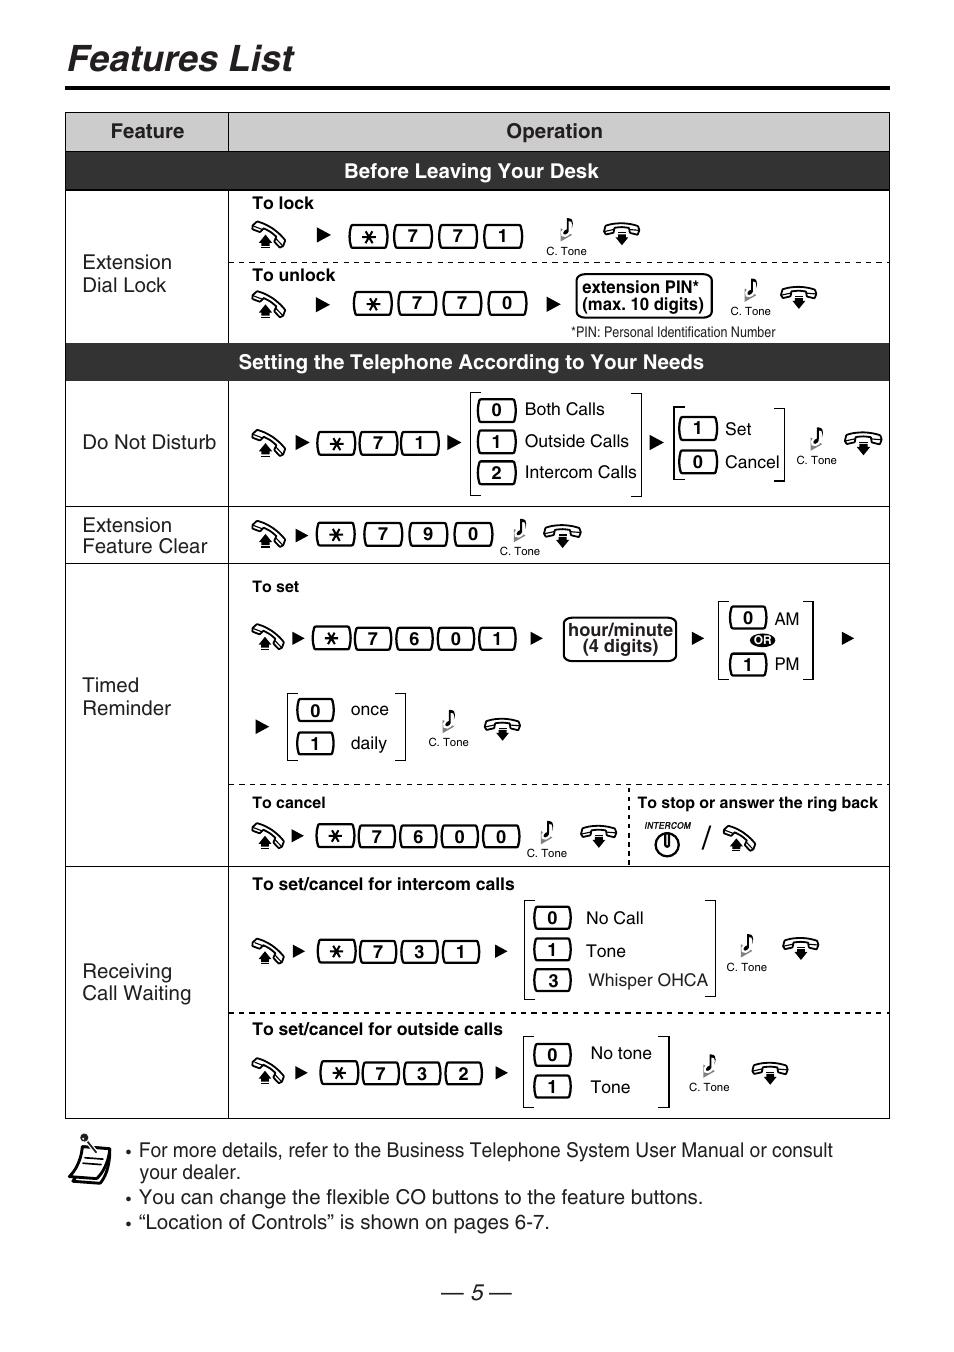 features list panasonic kx t7667 user manual page 5 10 rh manualsdir com panasonic kx-t7667 user manual panasonic digital super hybrid system kx-t7667 manual